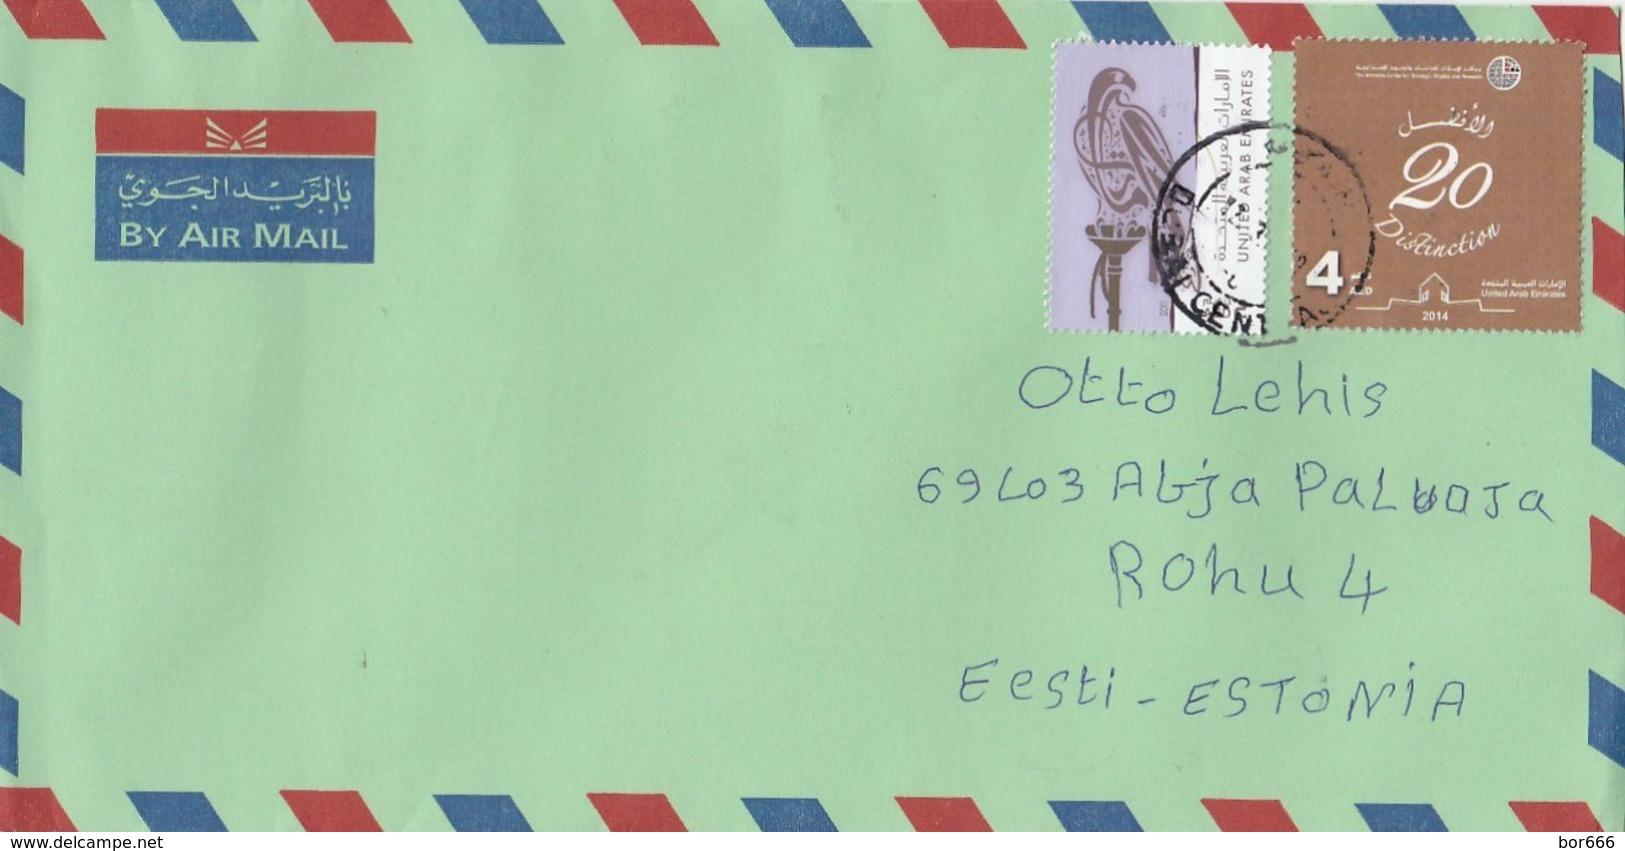 GOOD UAE Postal Cover To ESTONIA 2018 - Good Stamped: Birds ; Distinction 20 - United Arab Emirates